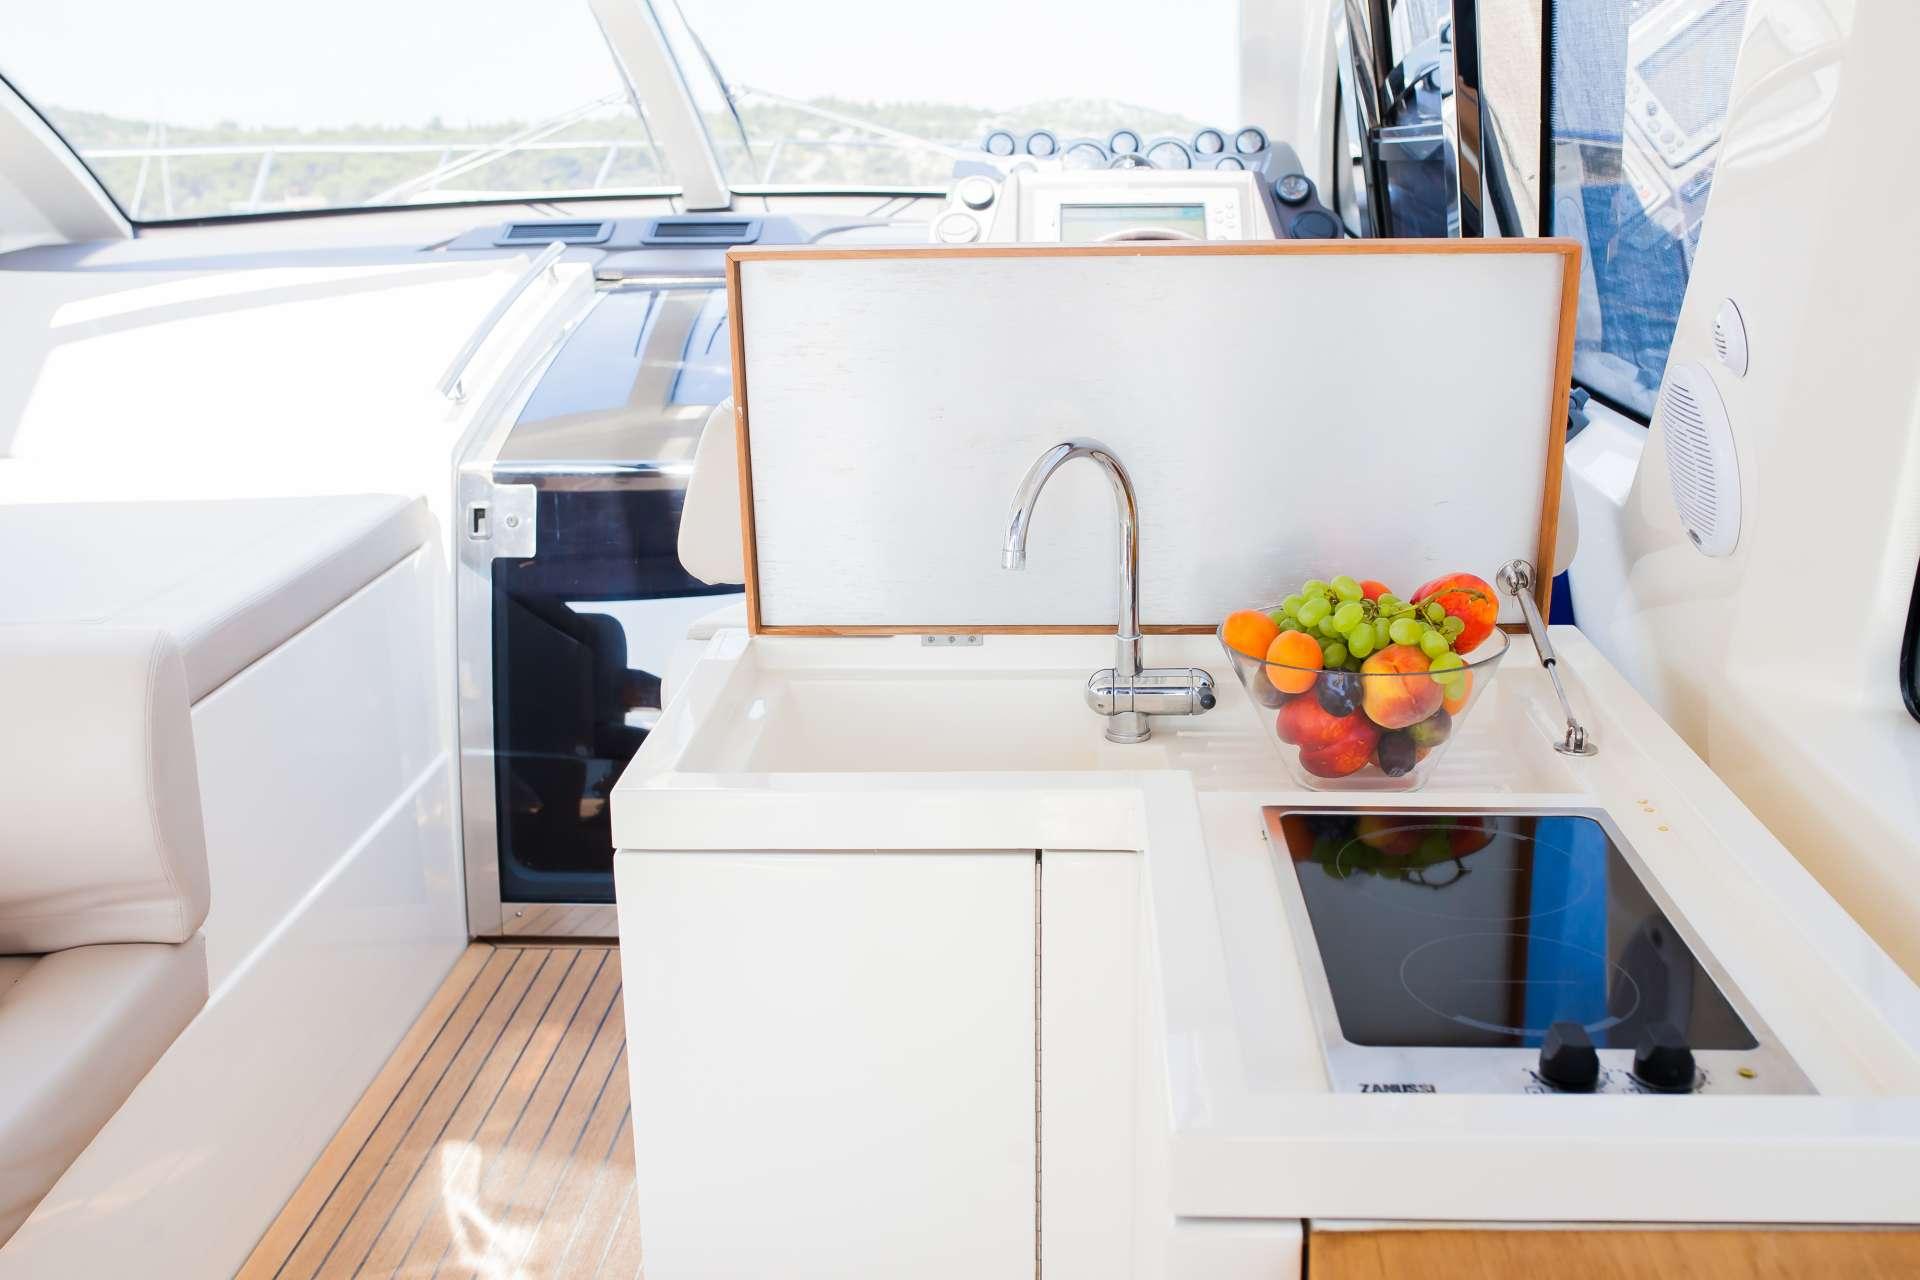 Moonraker Yacht Charter Motor Boat - Ritzy Charters